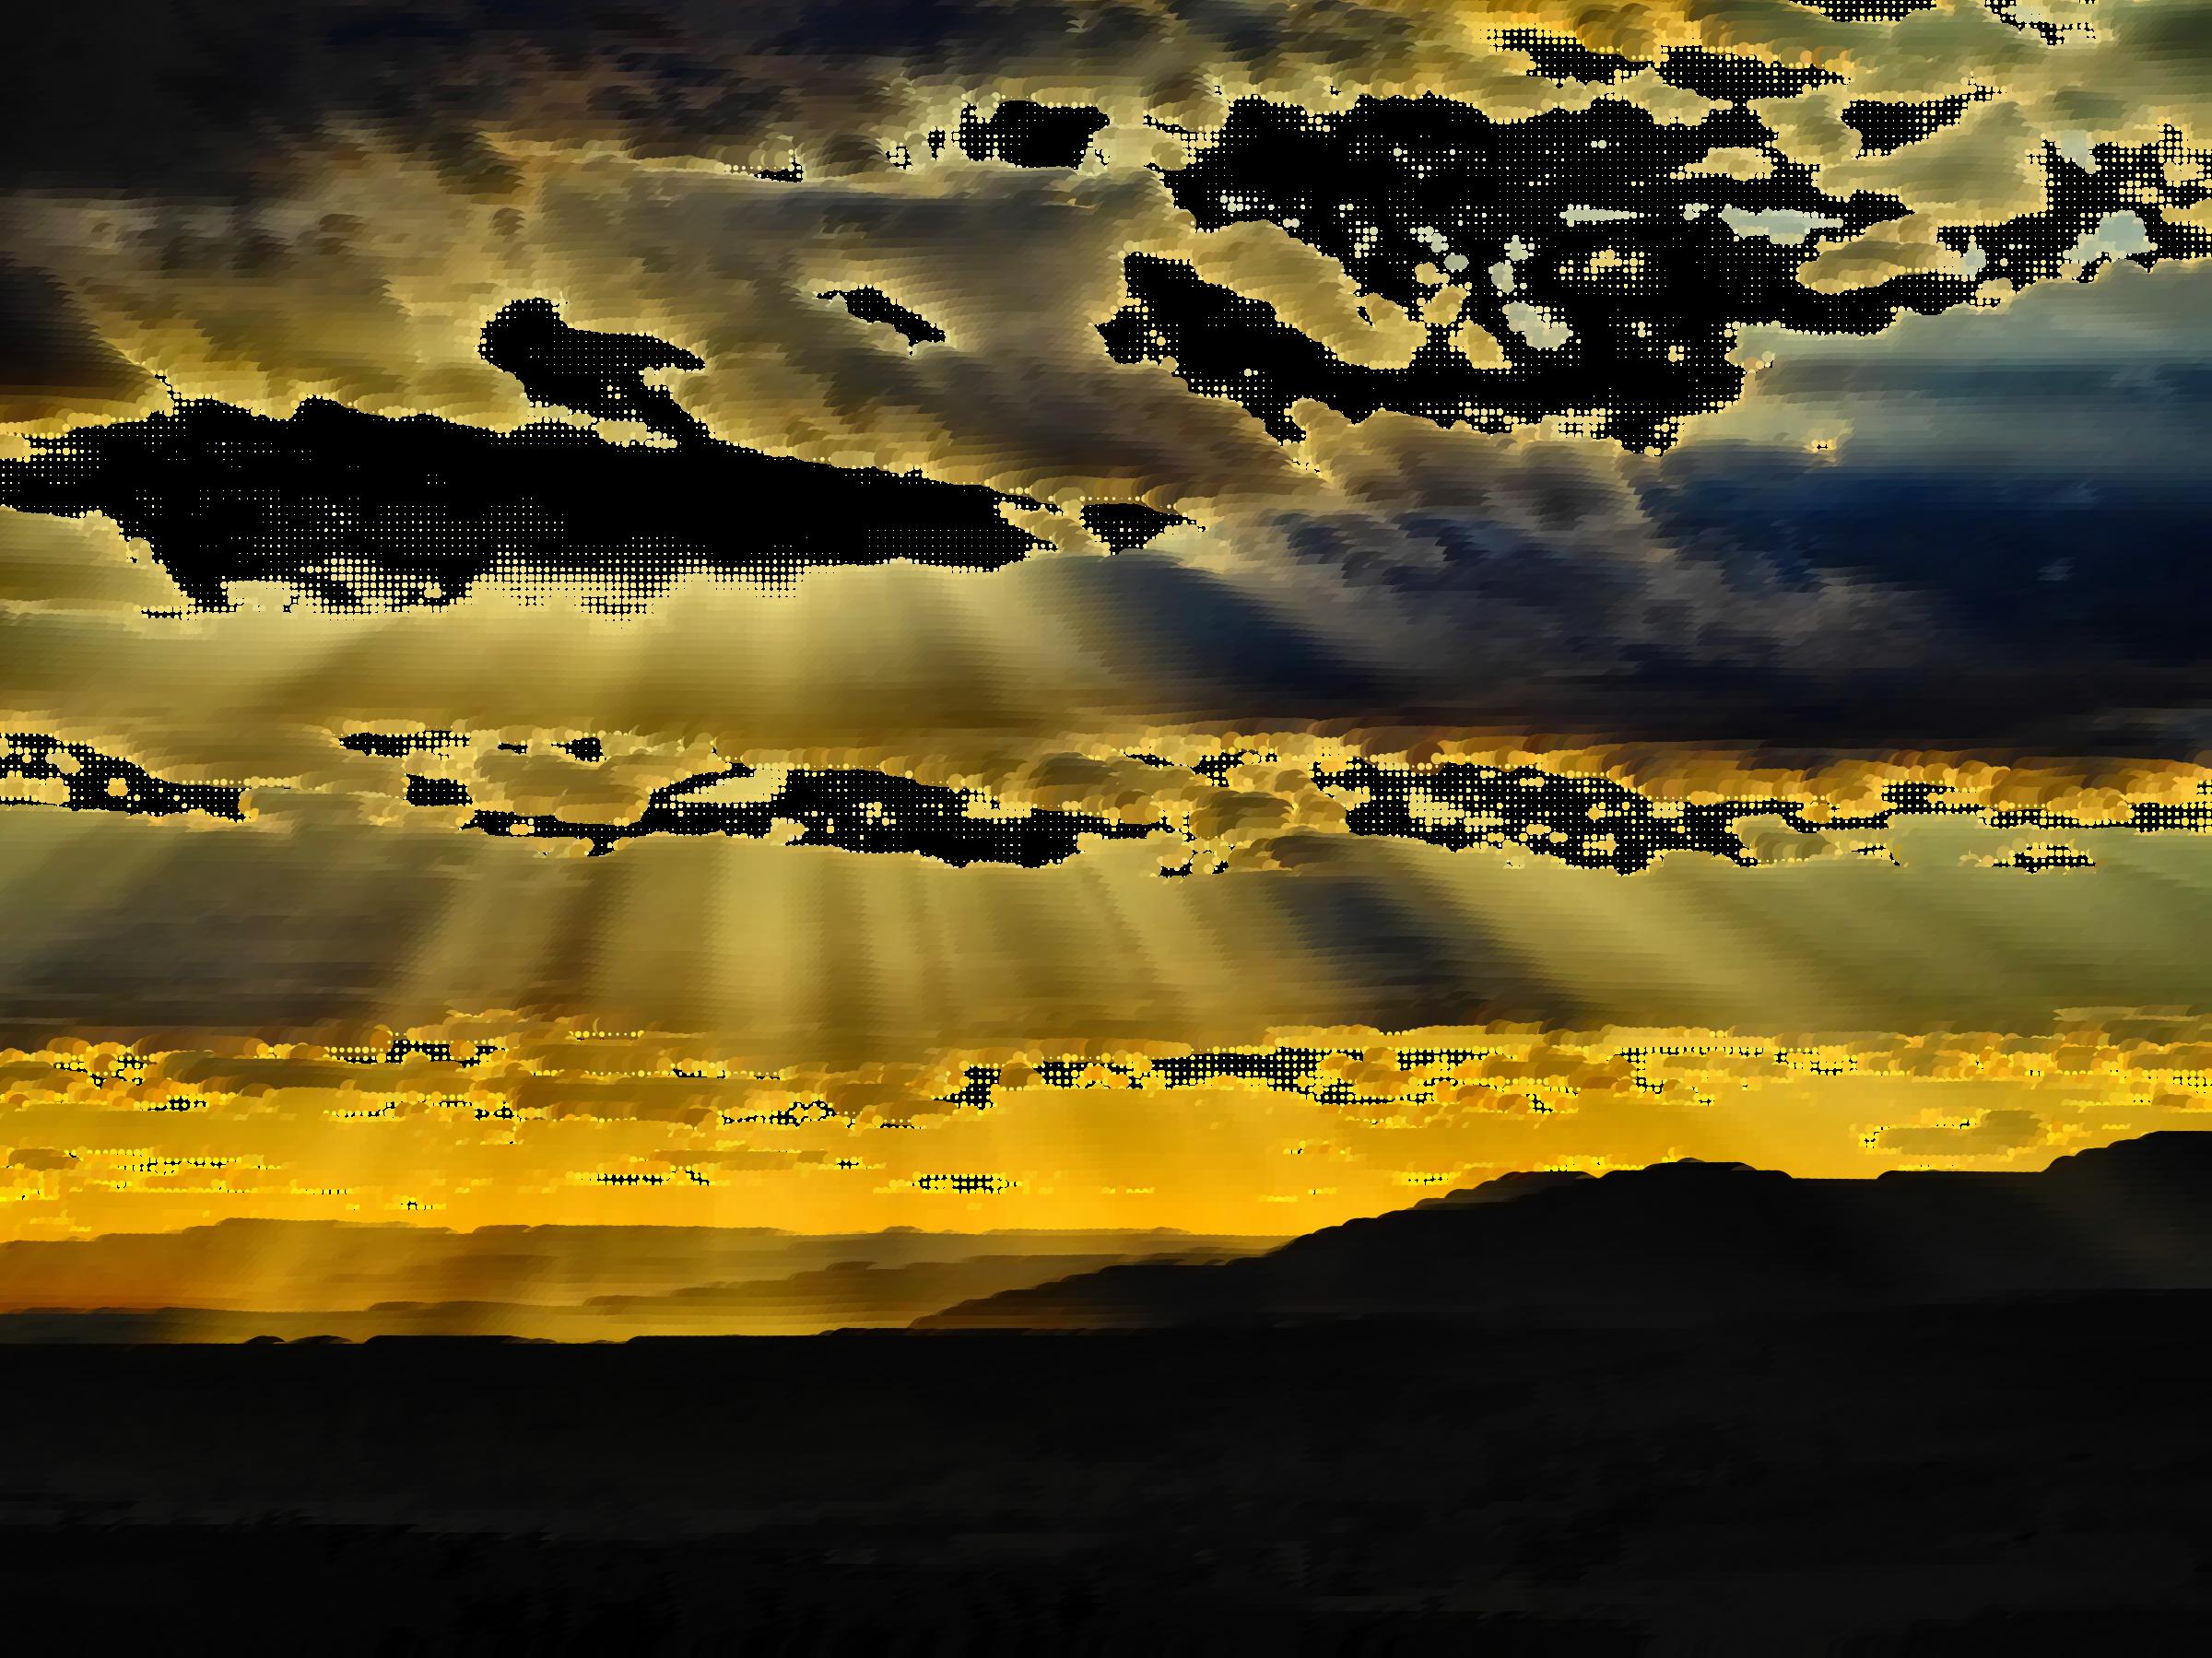 Sunset clipart sunset sky. Surreal cloudy big image